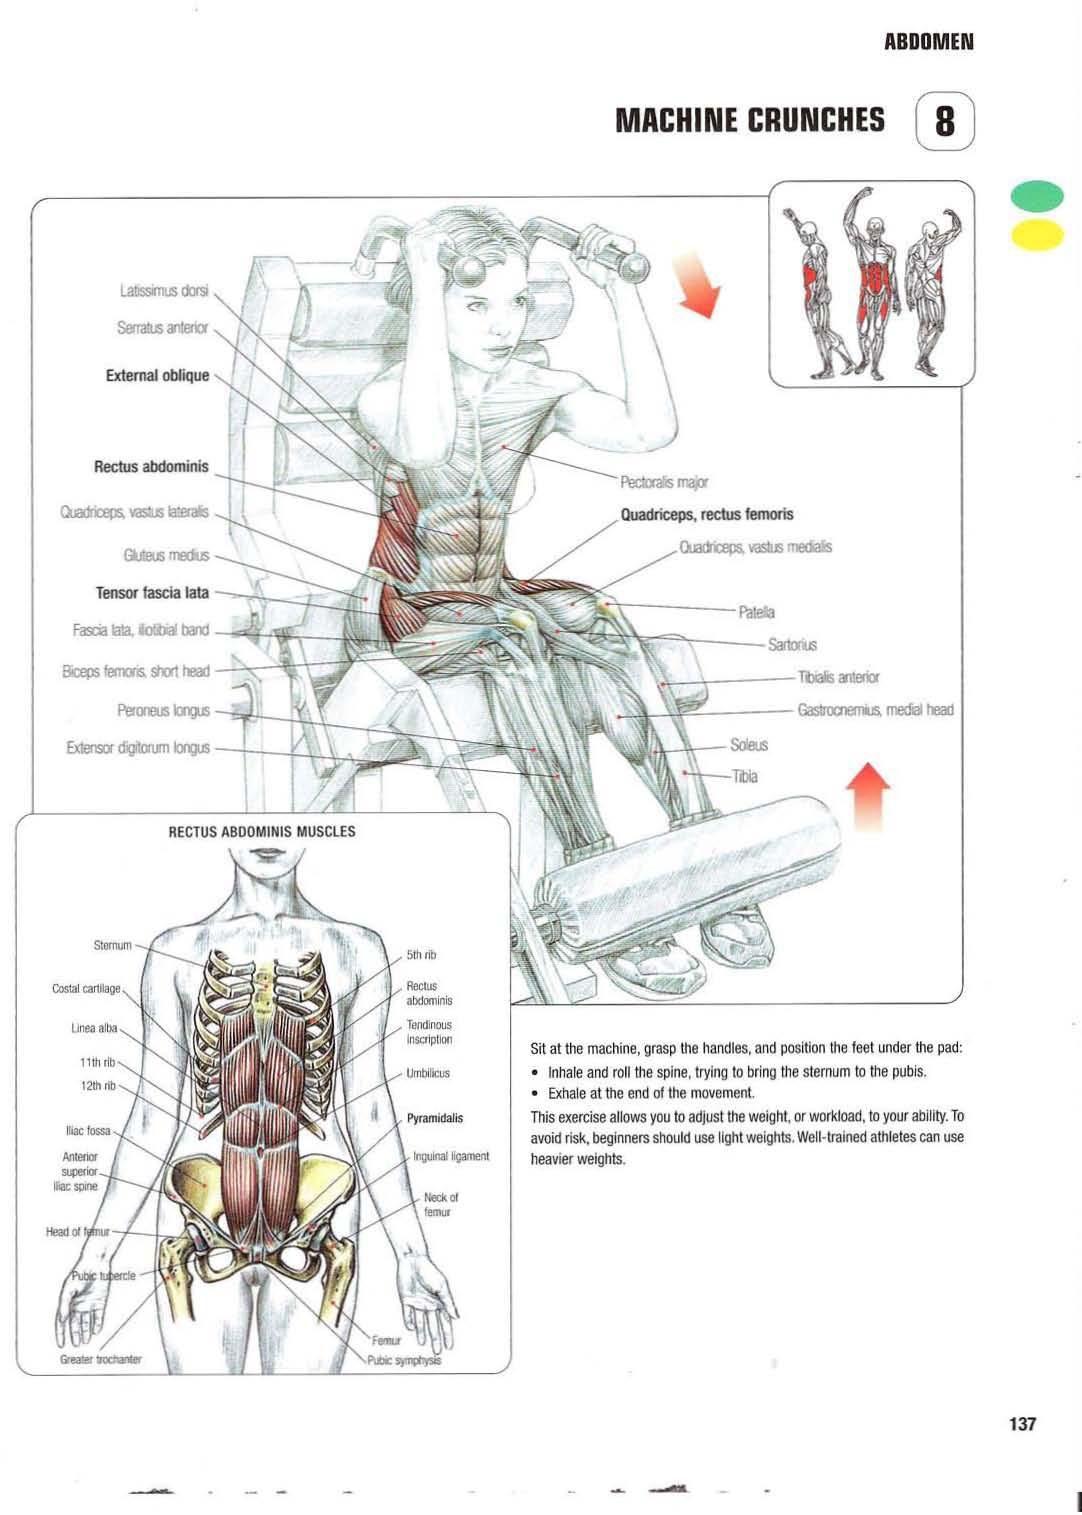 Strength Training Anatomy 8 Machine Crunches Abs Core Six Pack